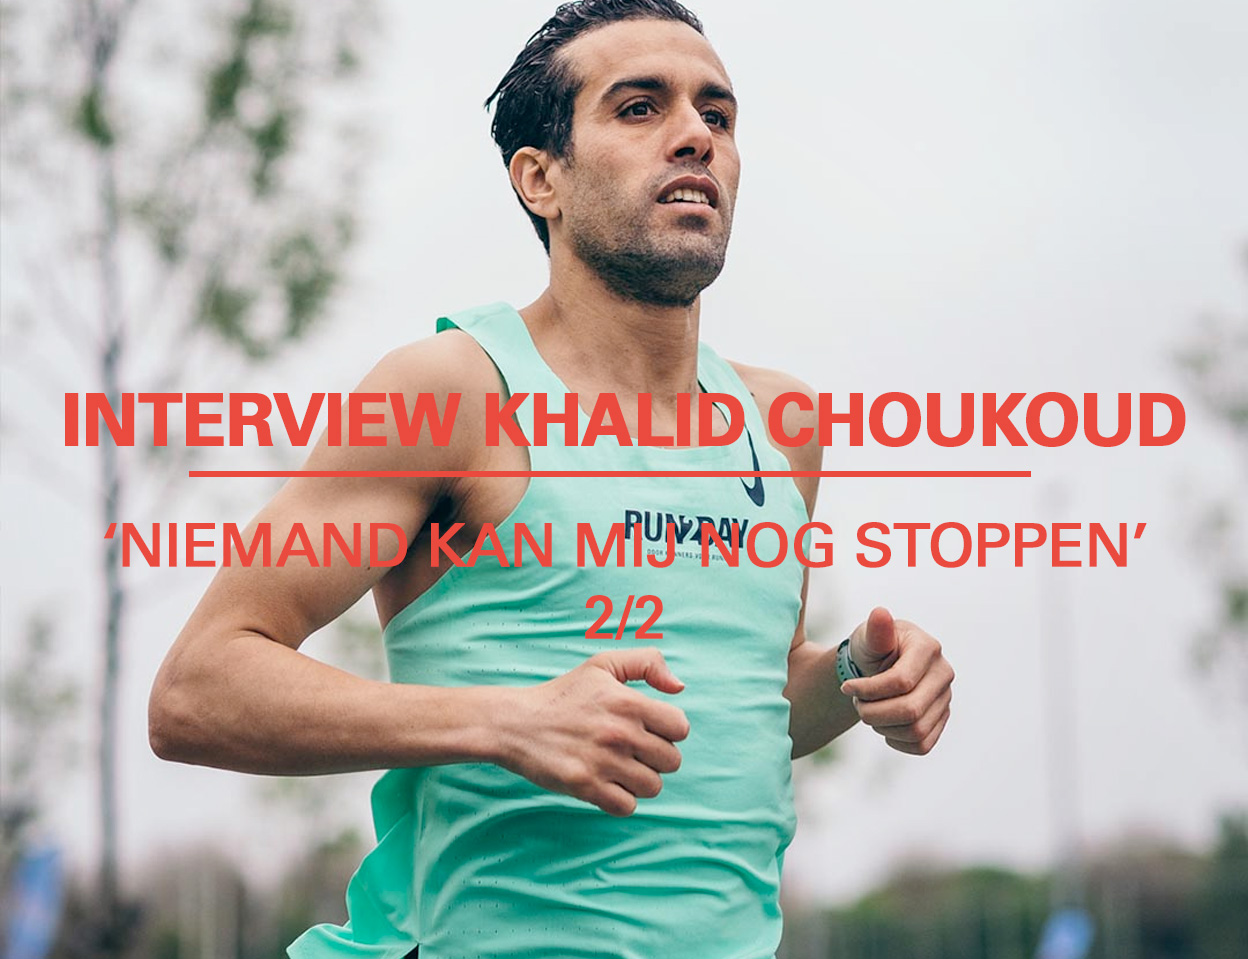 Khalid Choukoud interview